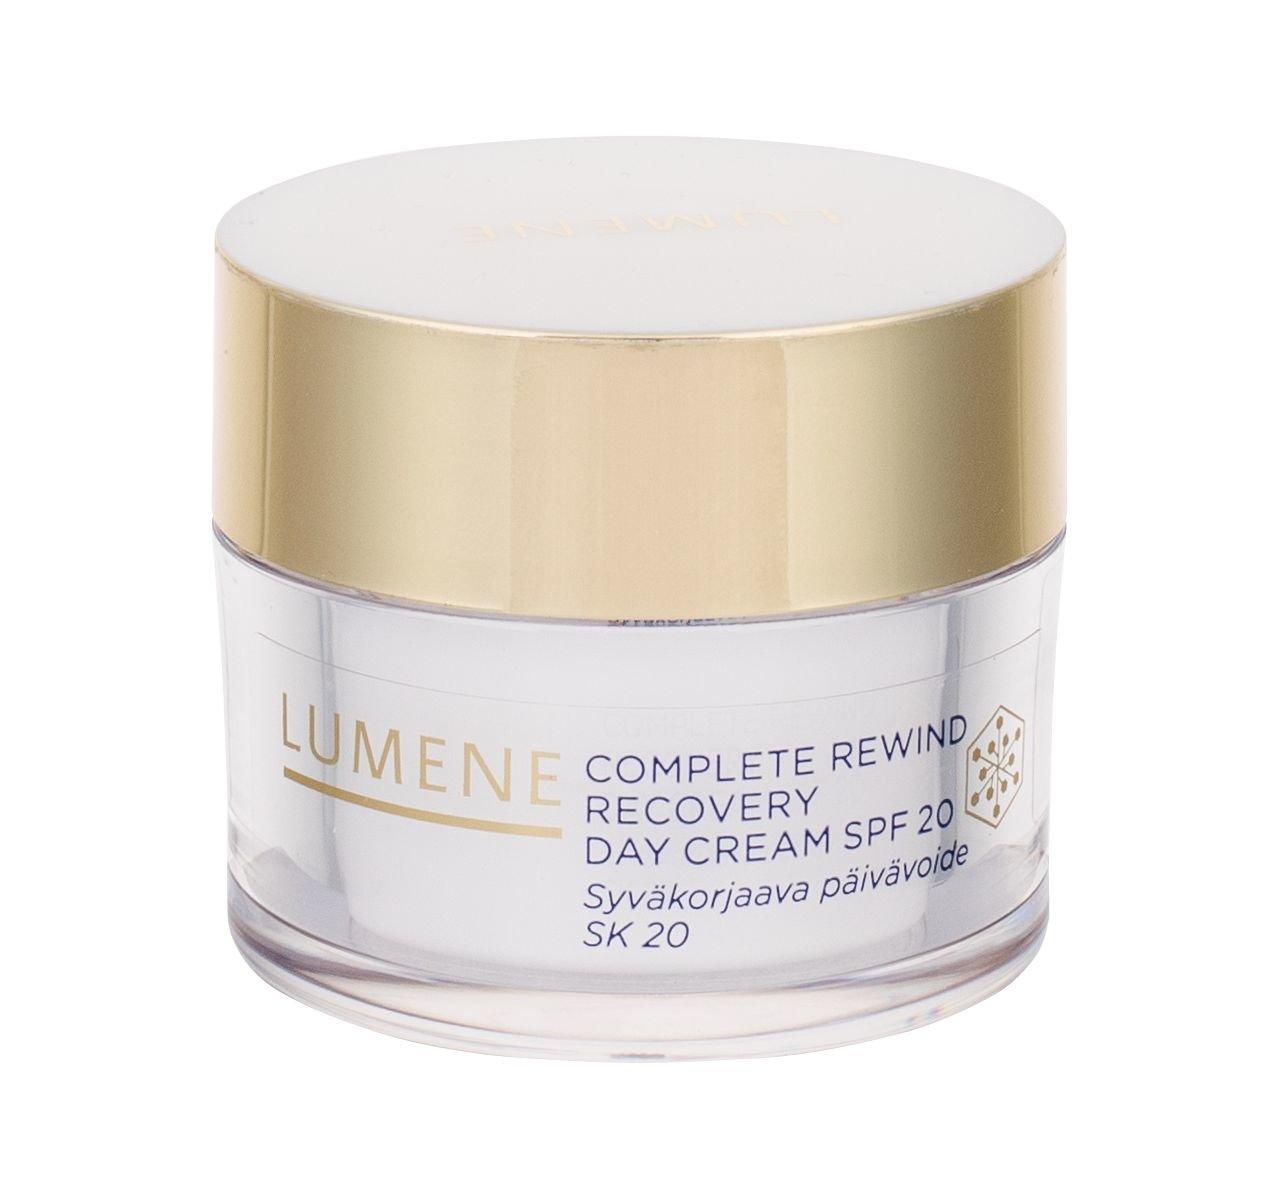 Lumene Complete Rewind Recovery Day Cream SPF20 Cosmetic 50ml